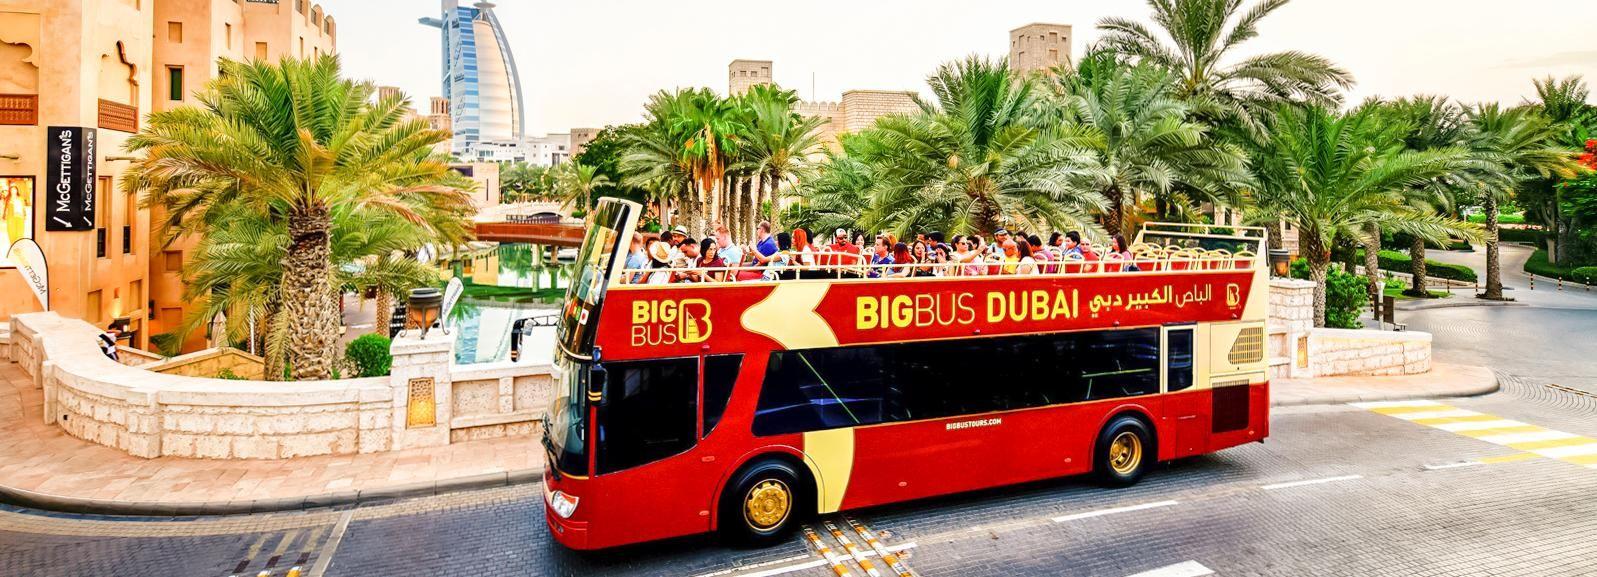 Dubai: Hop-On Hop-Off Classic, Premium or Deluxe Bus Ticket